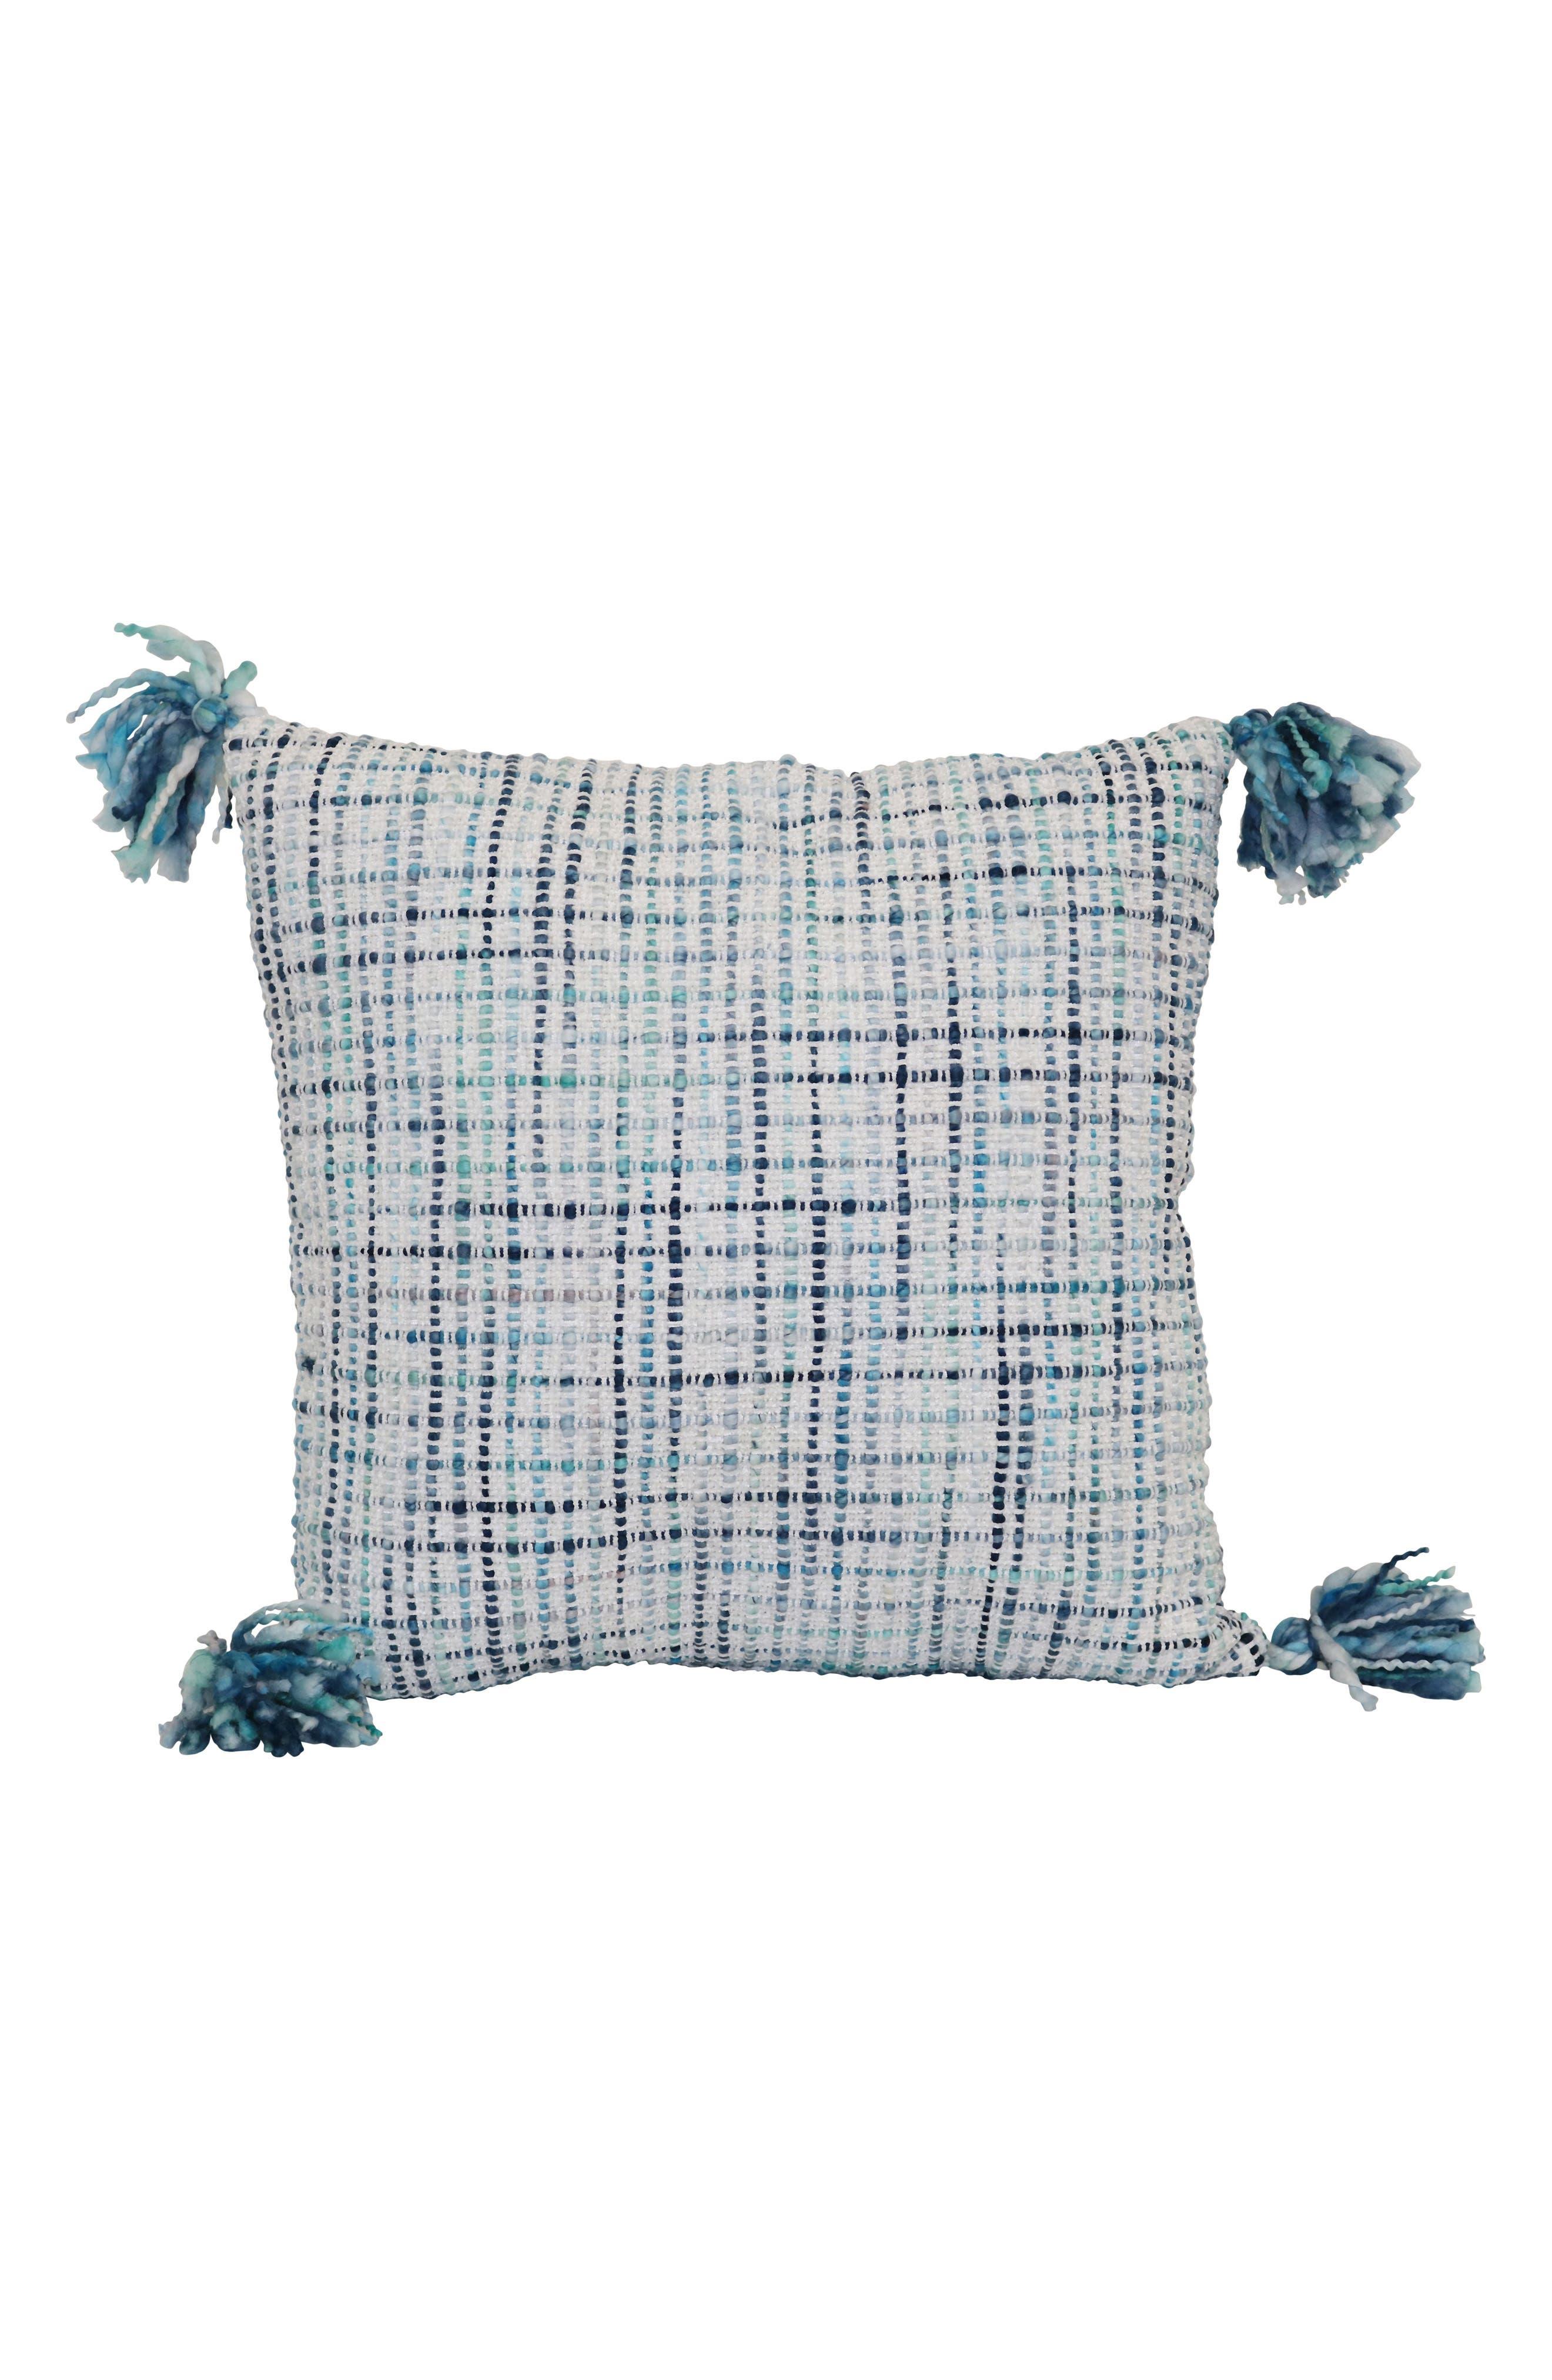 Main Image - Brentwood Originals Tassel Accent Pillow